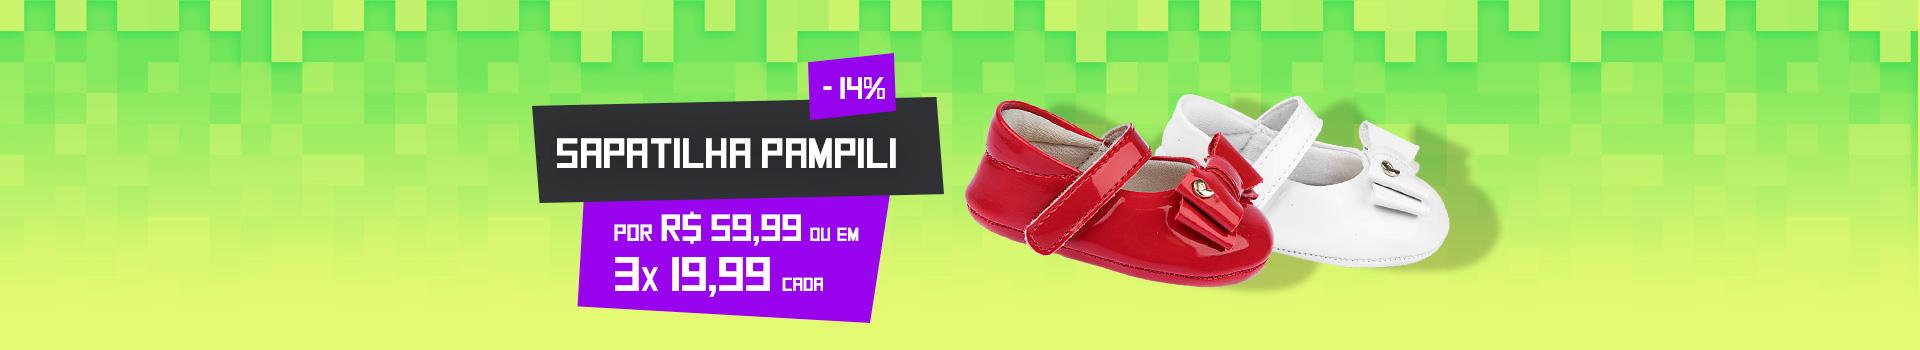 TV 3 - Minions Basket Velcro